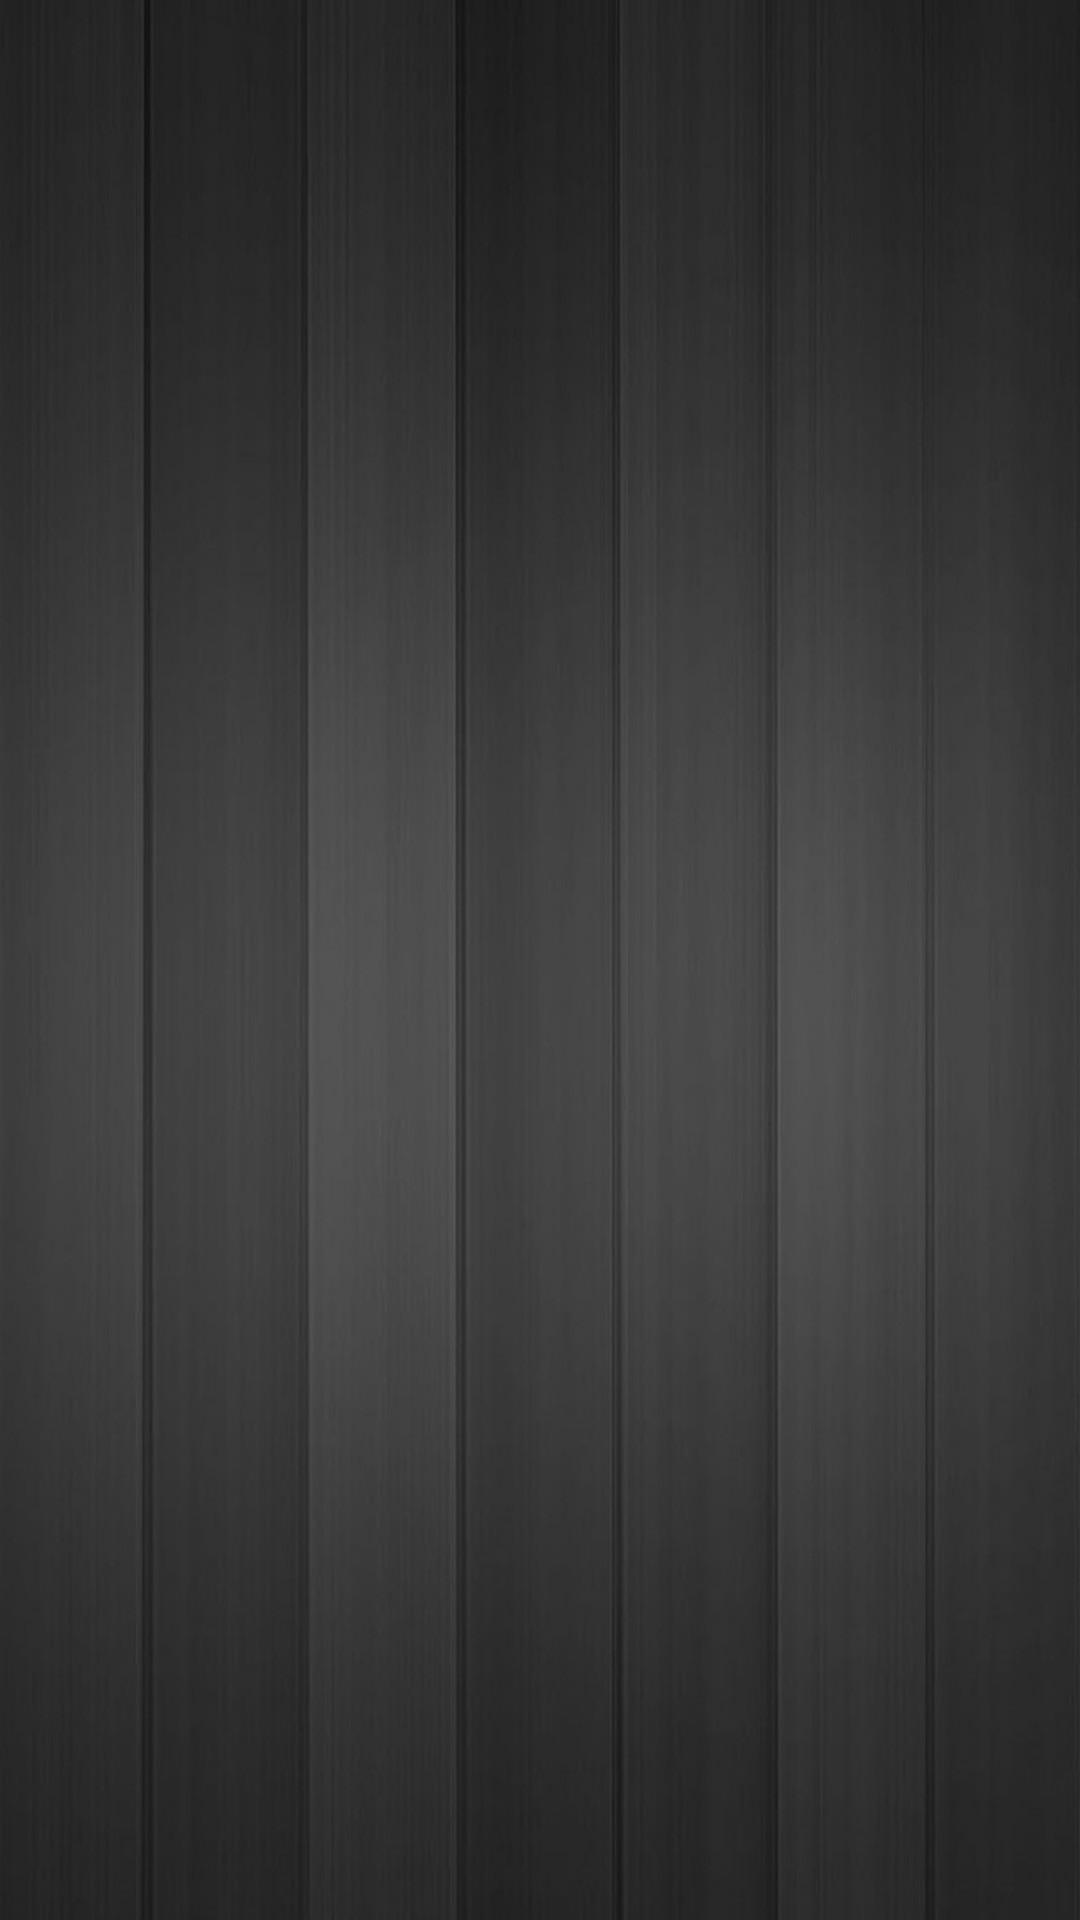 Gray wood LG G2 Wallpapers